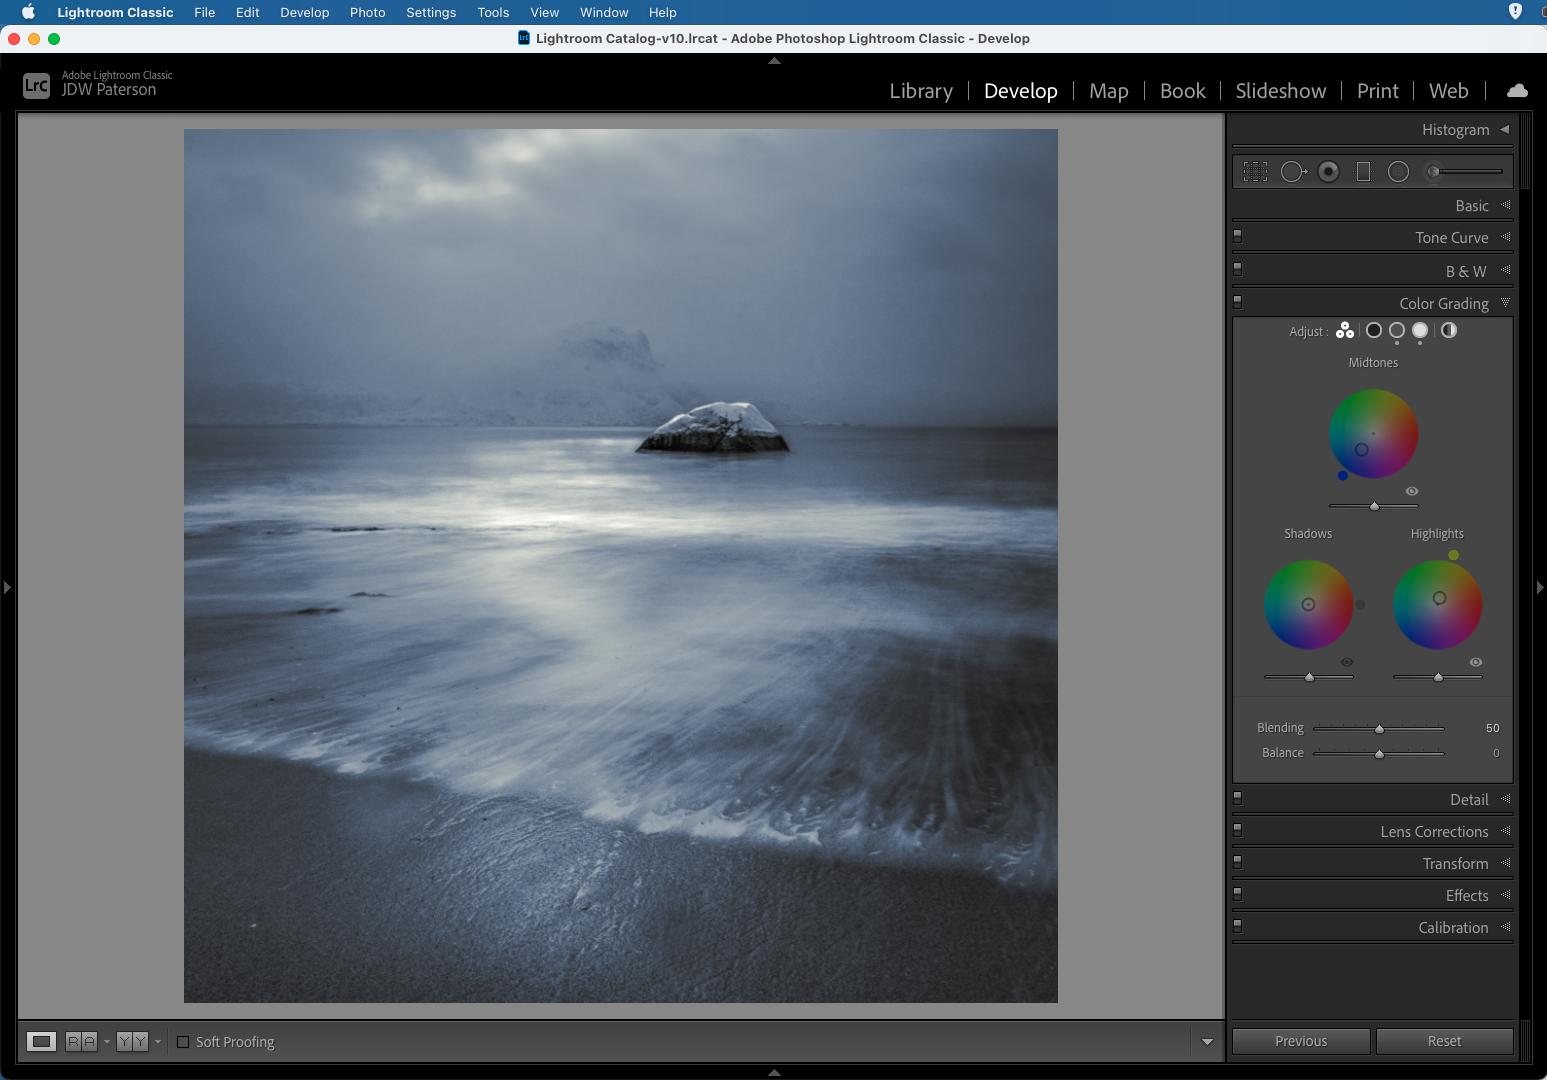 Screenshot showing the Color Grading wheels in Adobe Lightroom